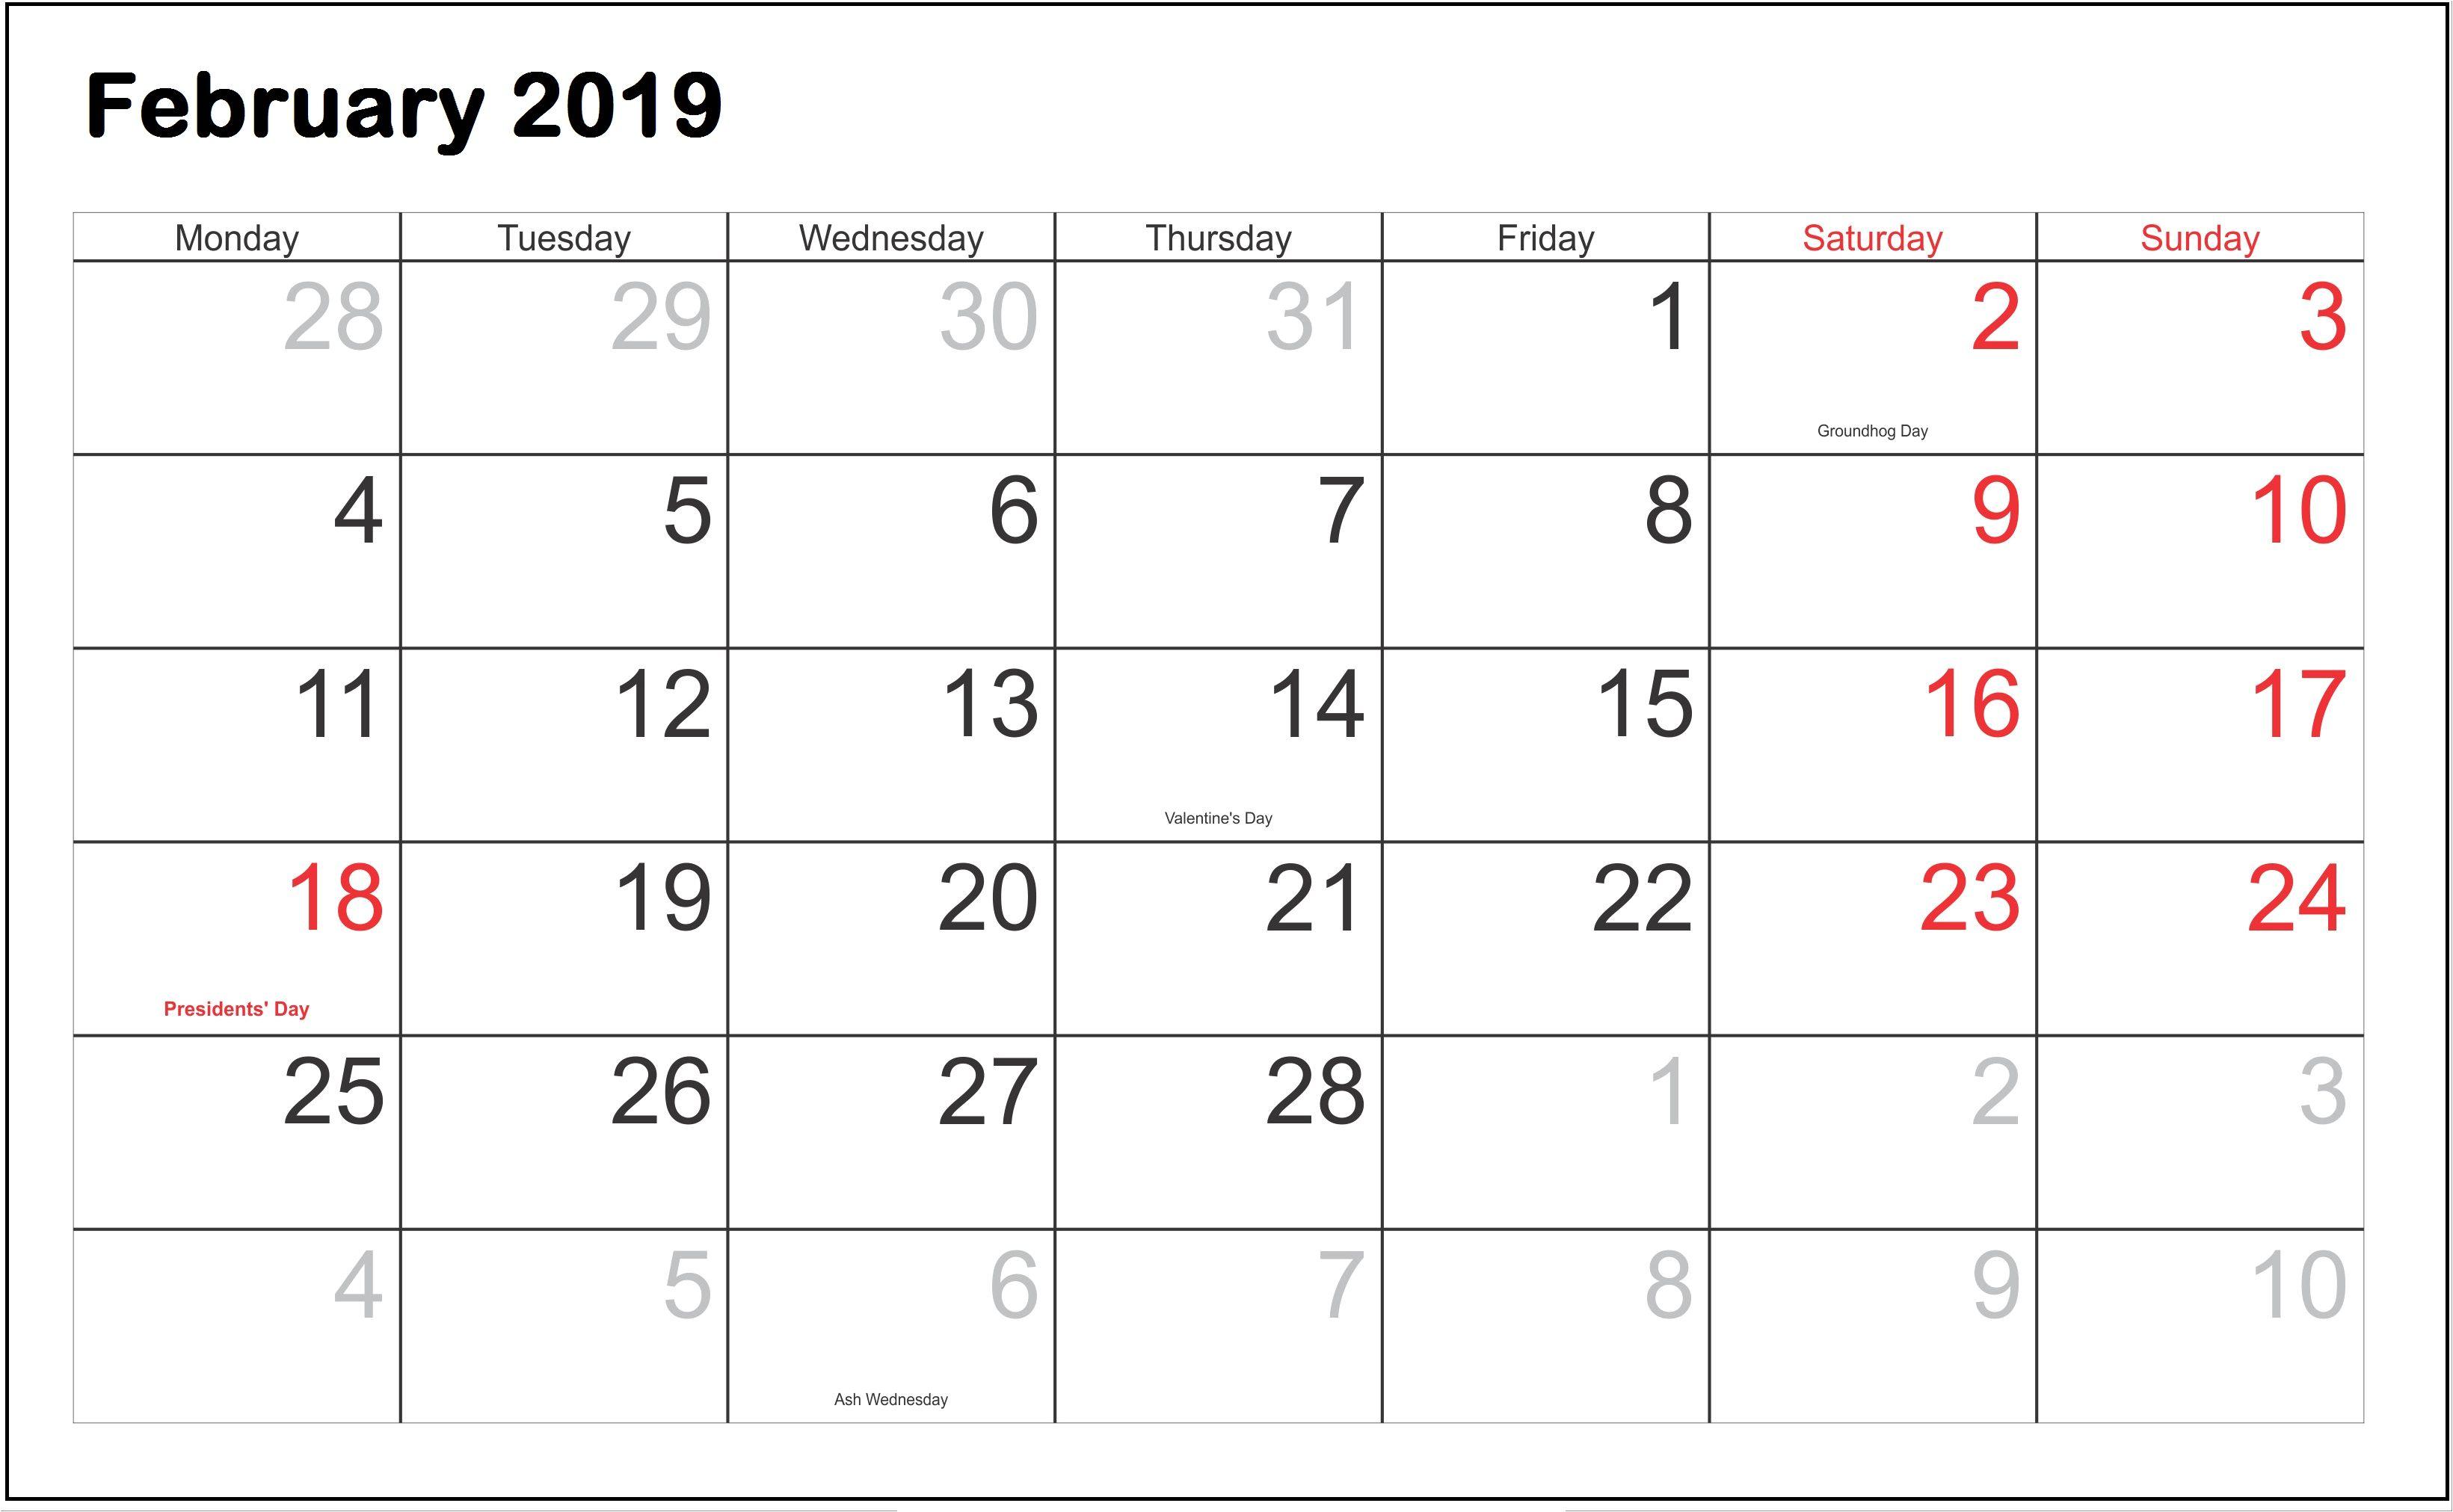 February 2019 Calendar National Print February 2019 Calendar #February #february2019 #USA